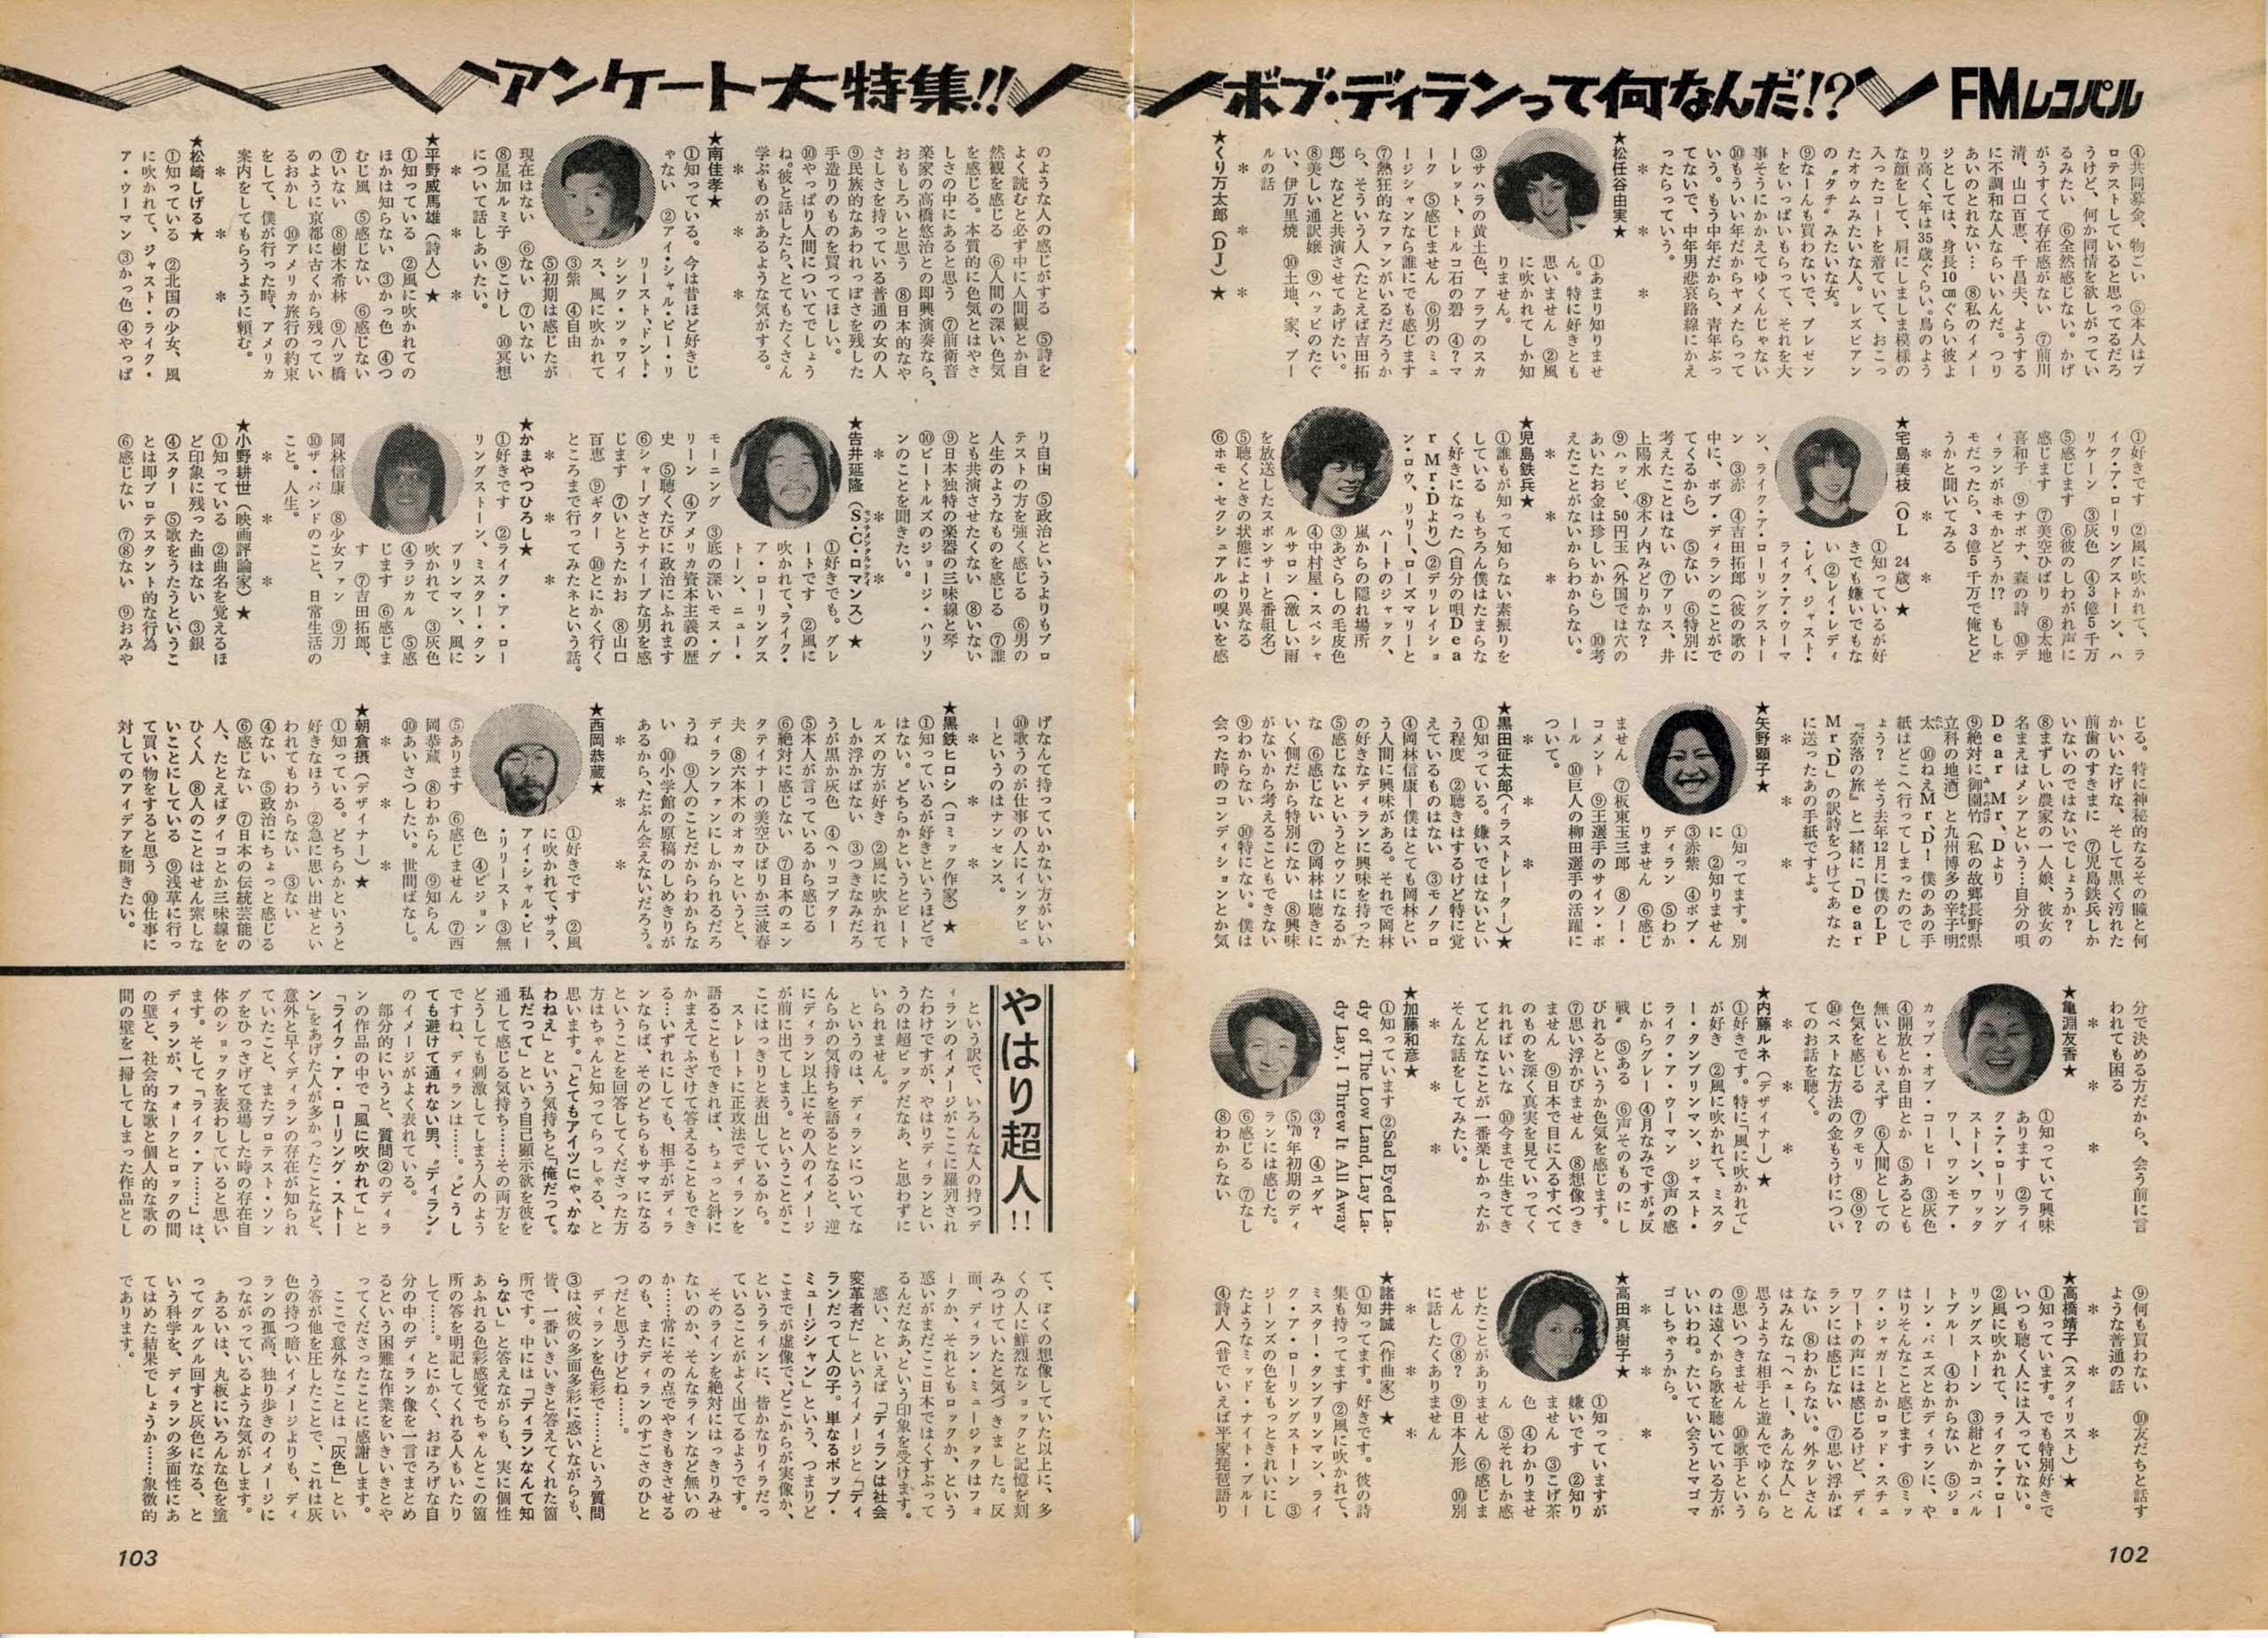 1978 FMrecopal